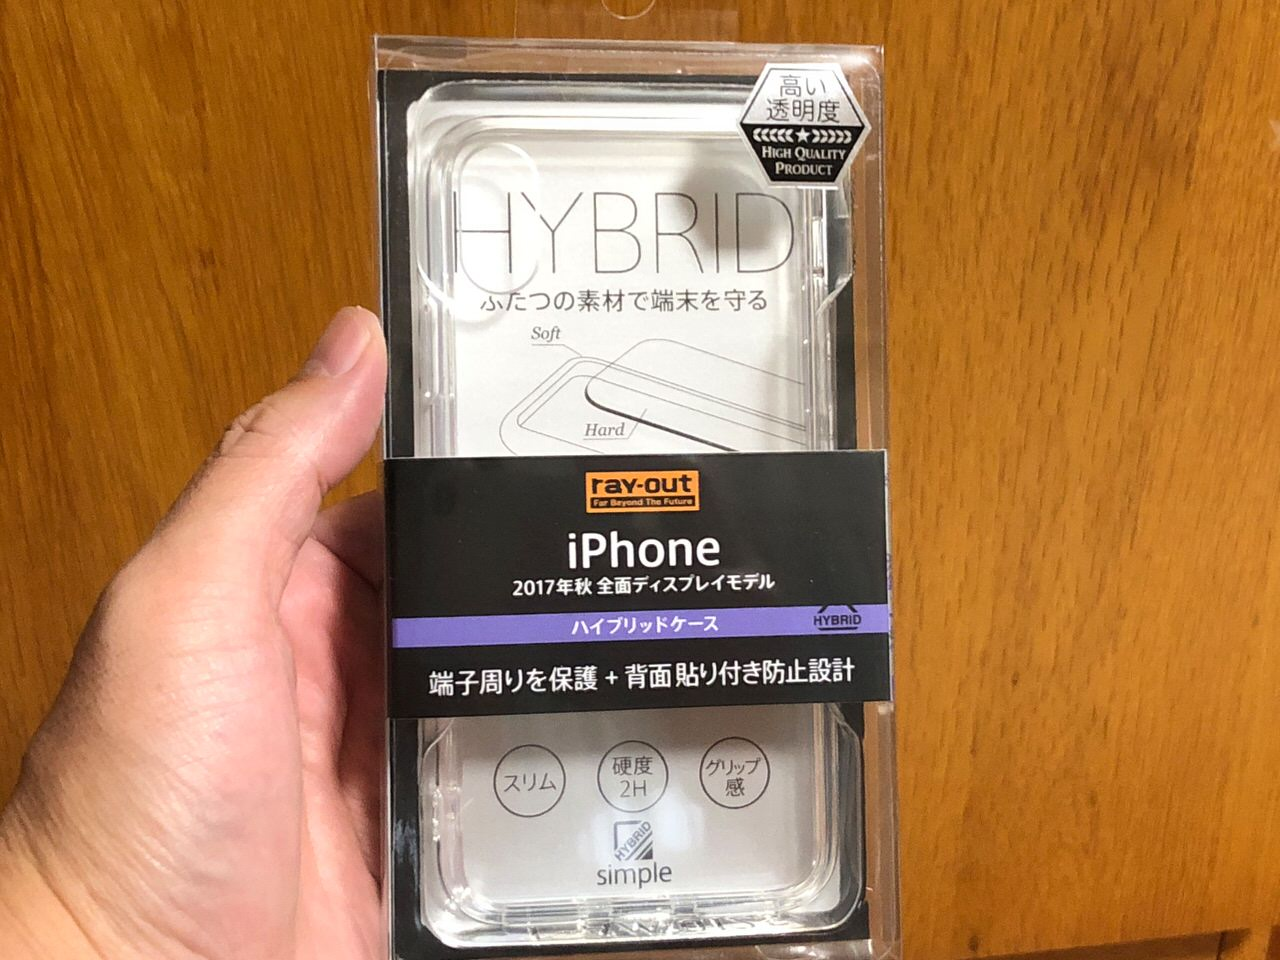 Iphone x firstimpresion 0417